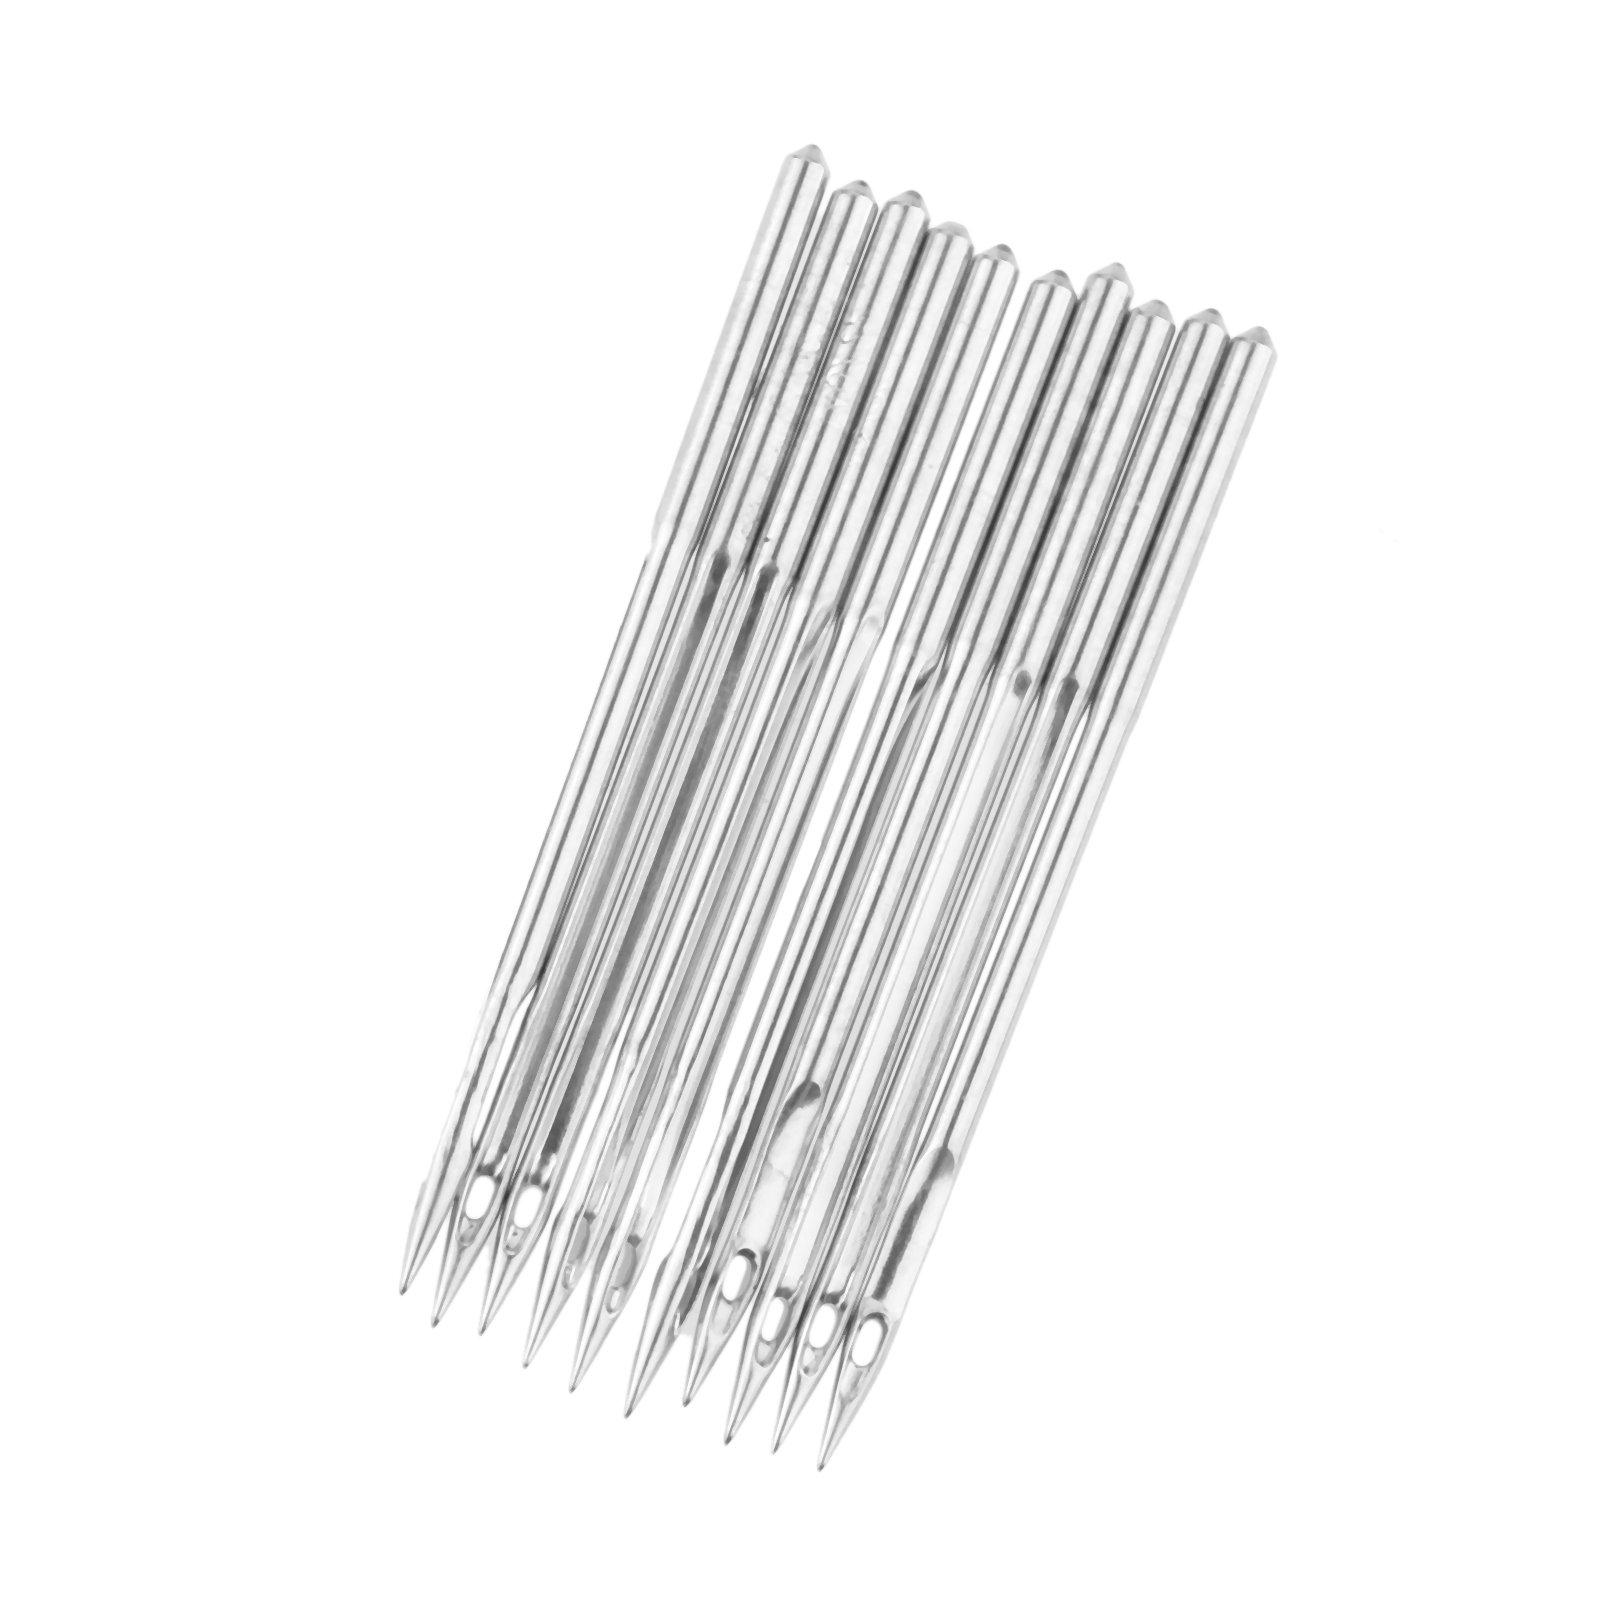 DBX1 14//90 ORGAN NEEDLE DDL-5550 JUKI DDL-8700 DDL-8700-7 100 Japan Organ Sewing Machine Needles fit for JUKI DDL-555,DDL-5530